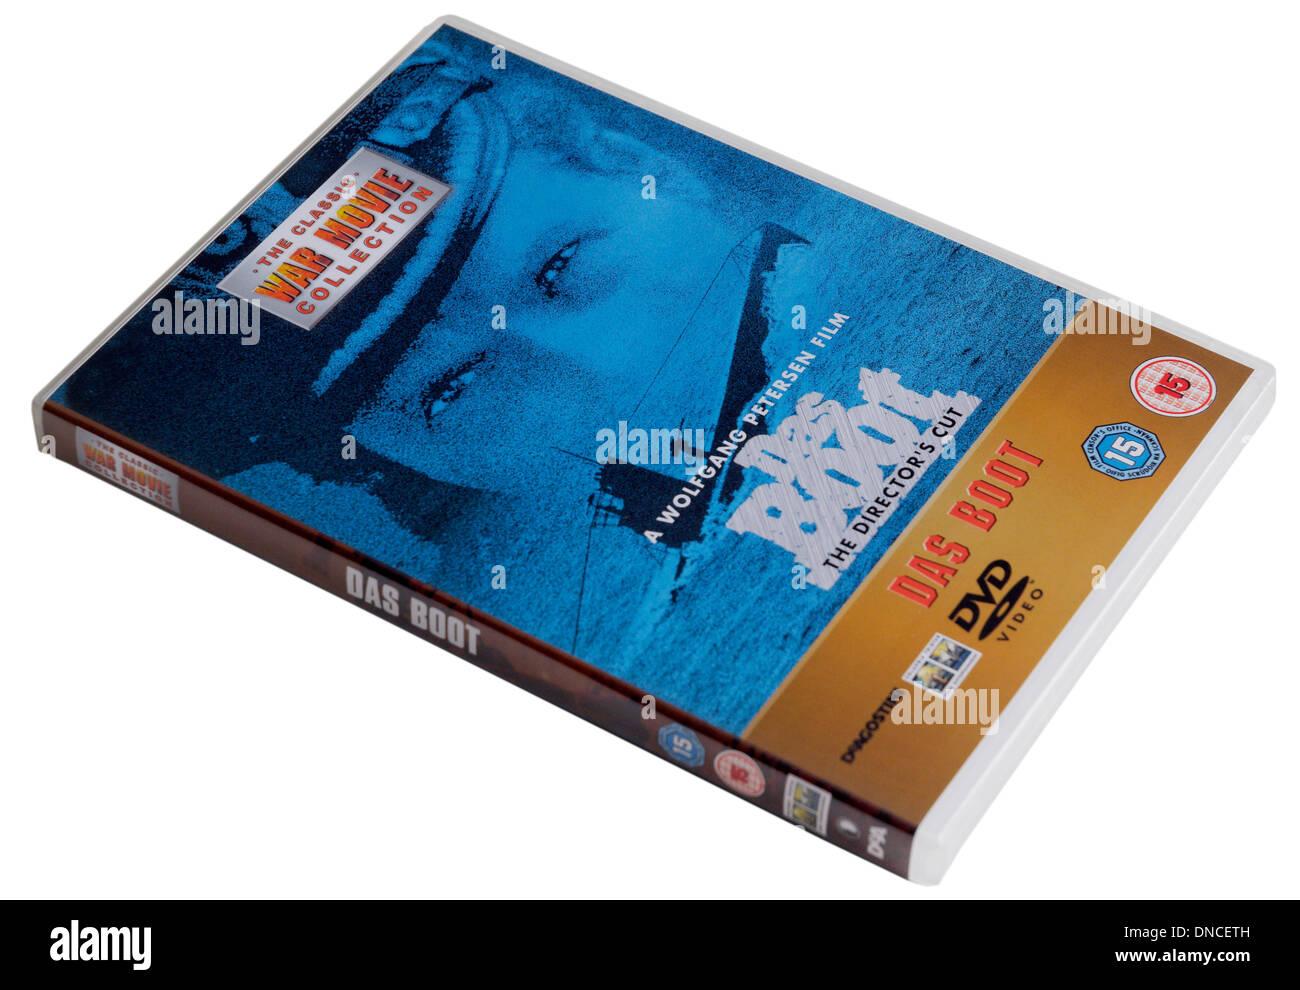 Das Boot DVD - Stock Image